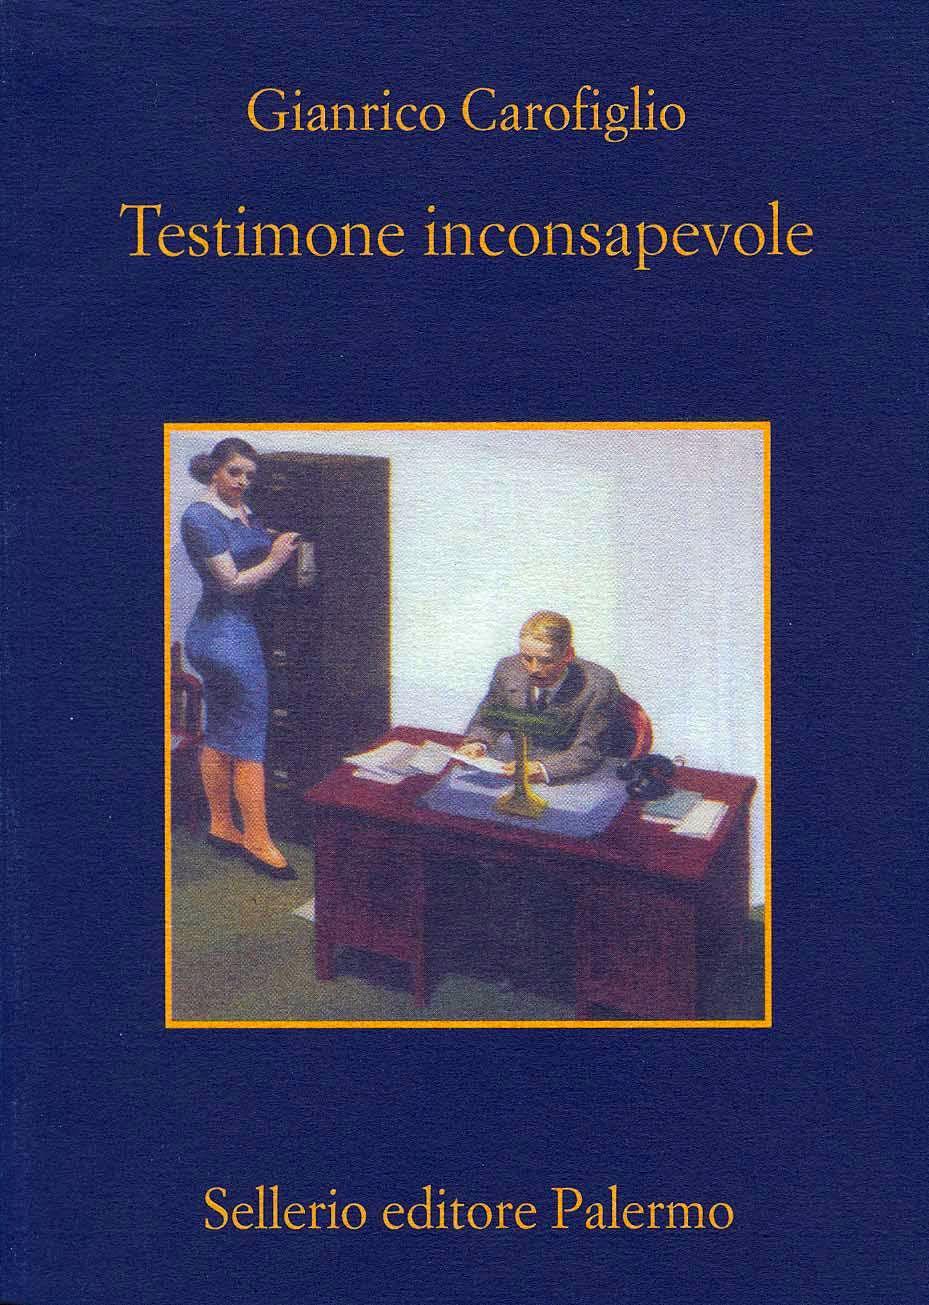 Testimone-Inconsapevole